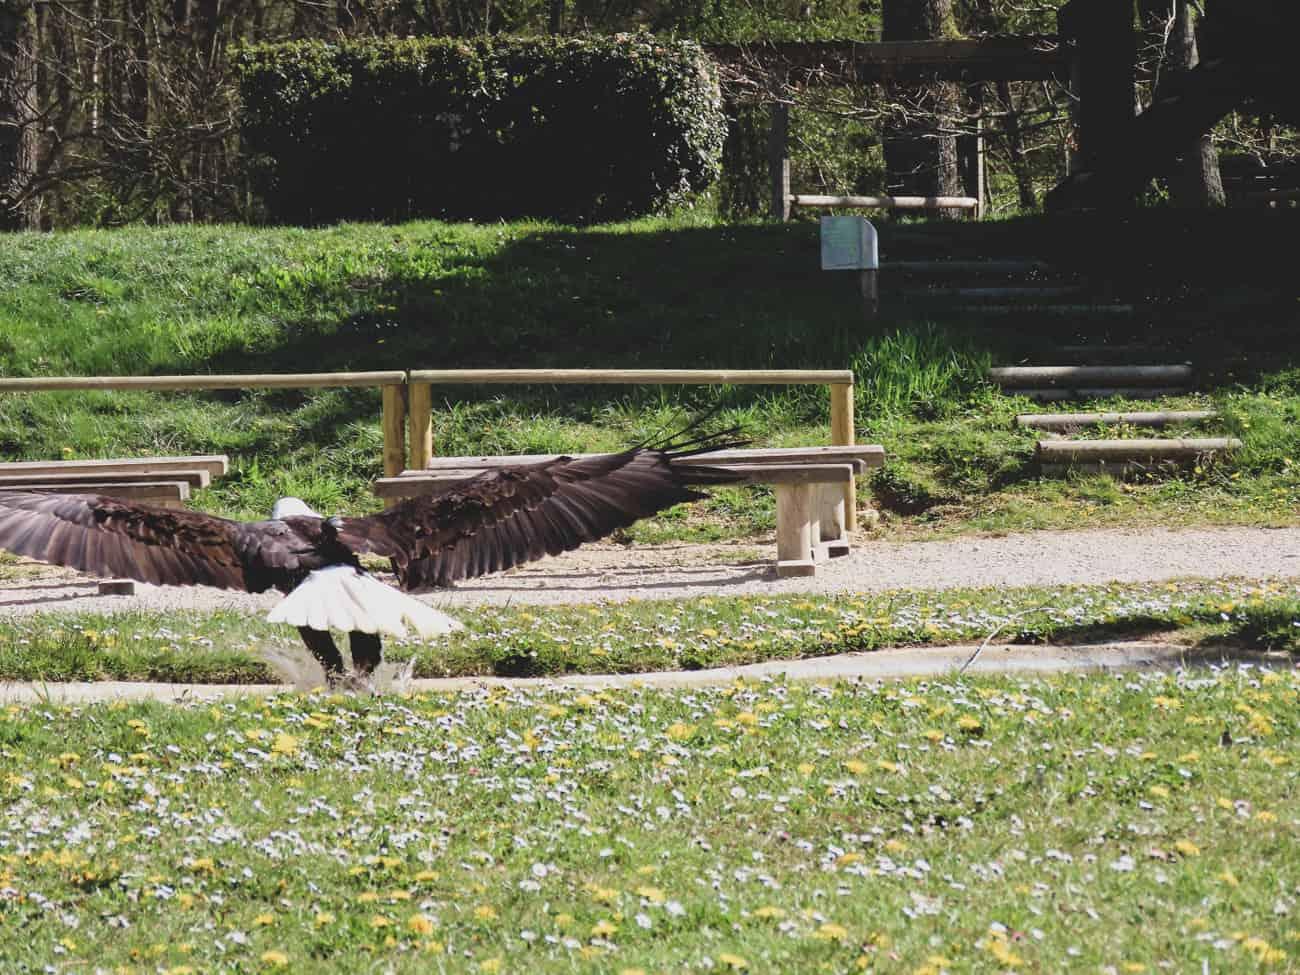 rambouillet-espace-rambouillet-spectacle-rapaces-cerfs-10